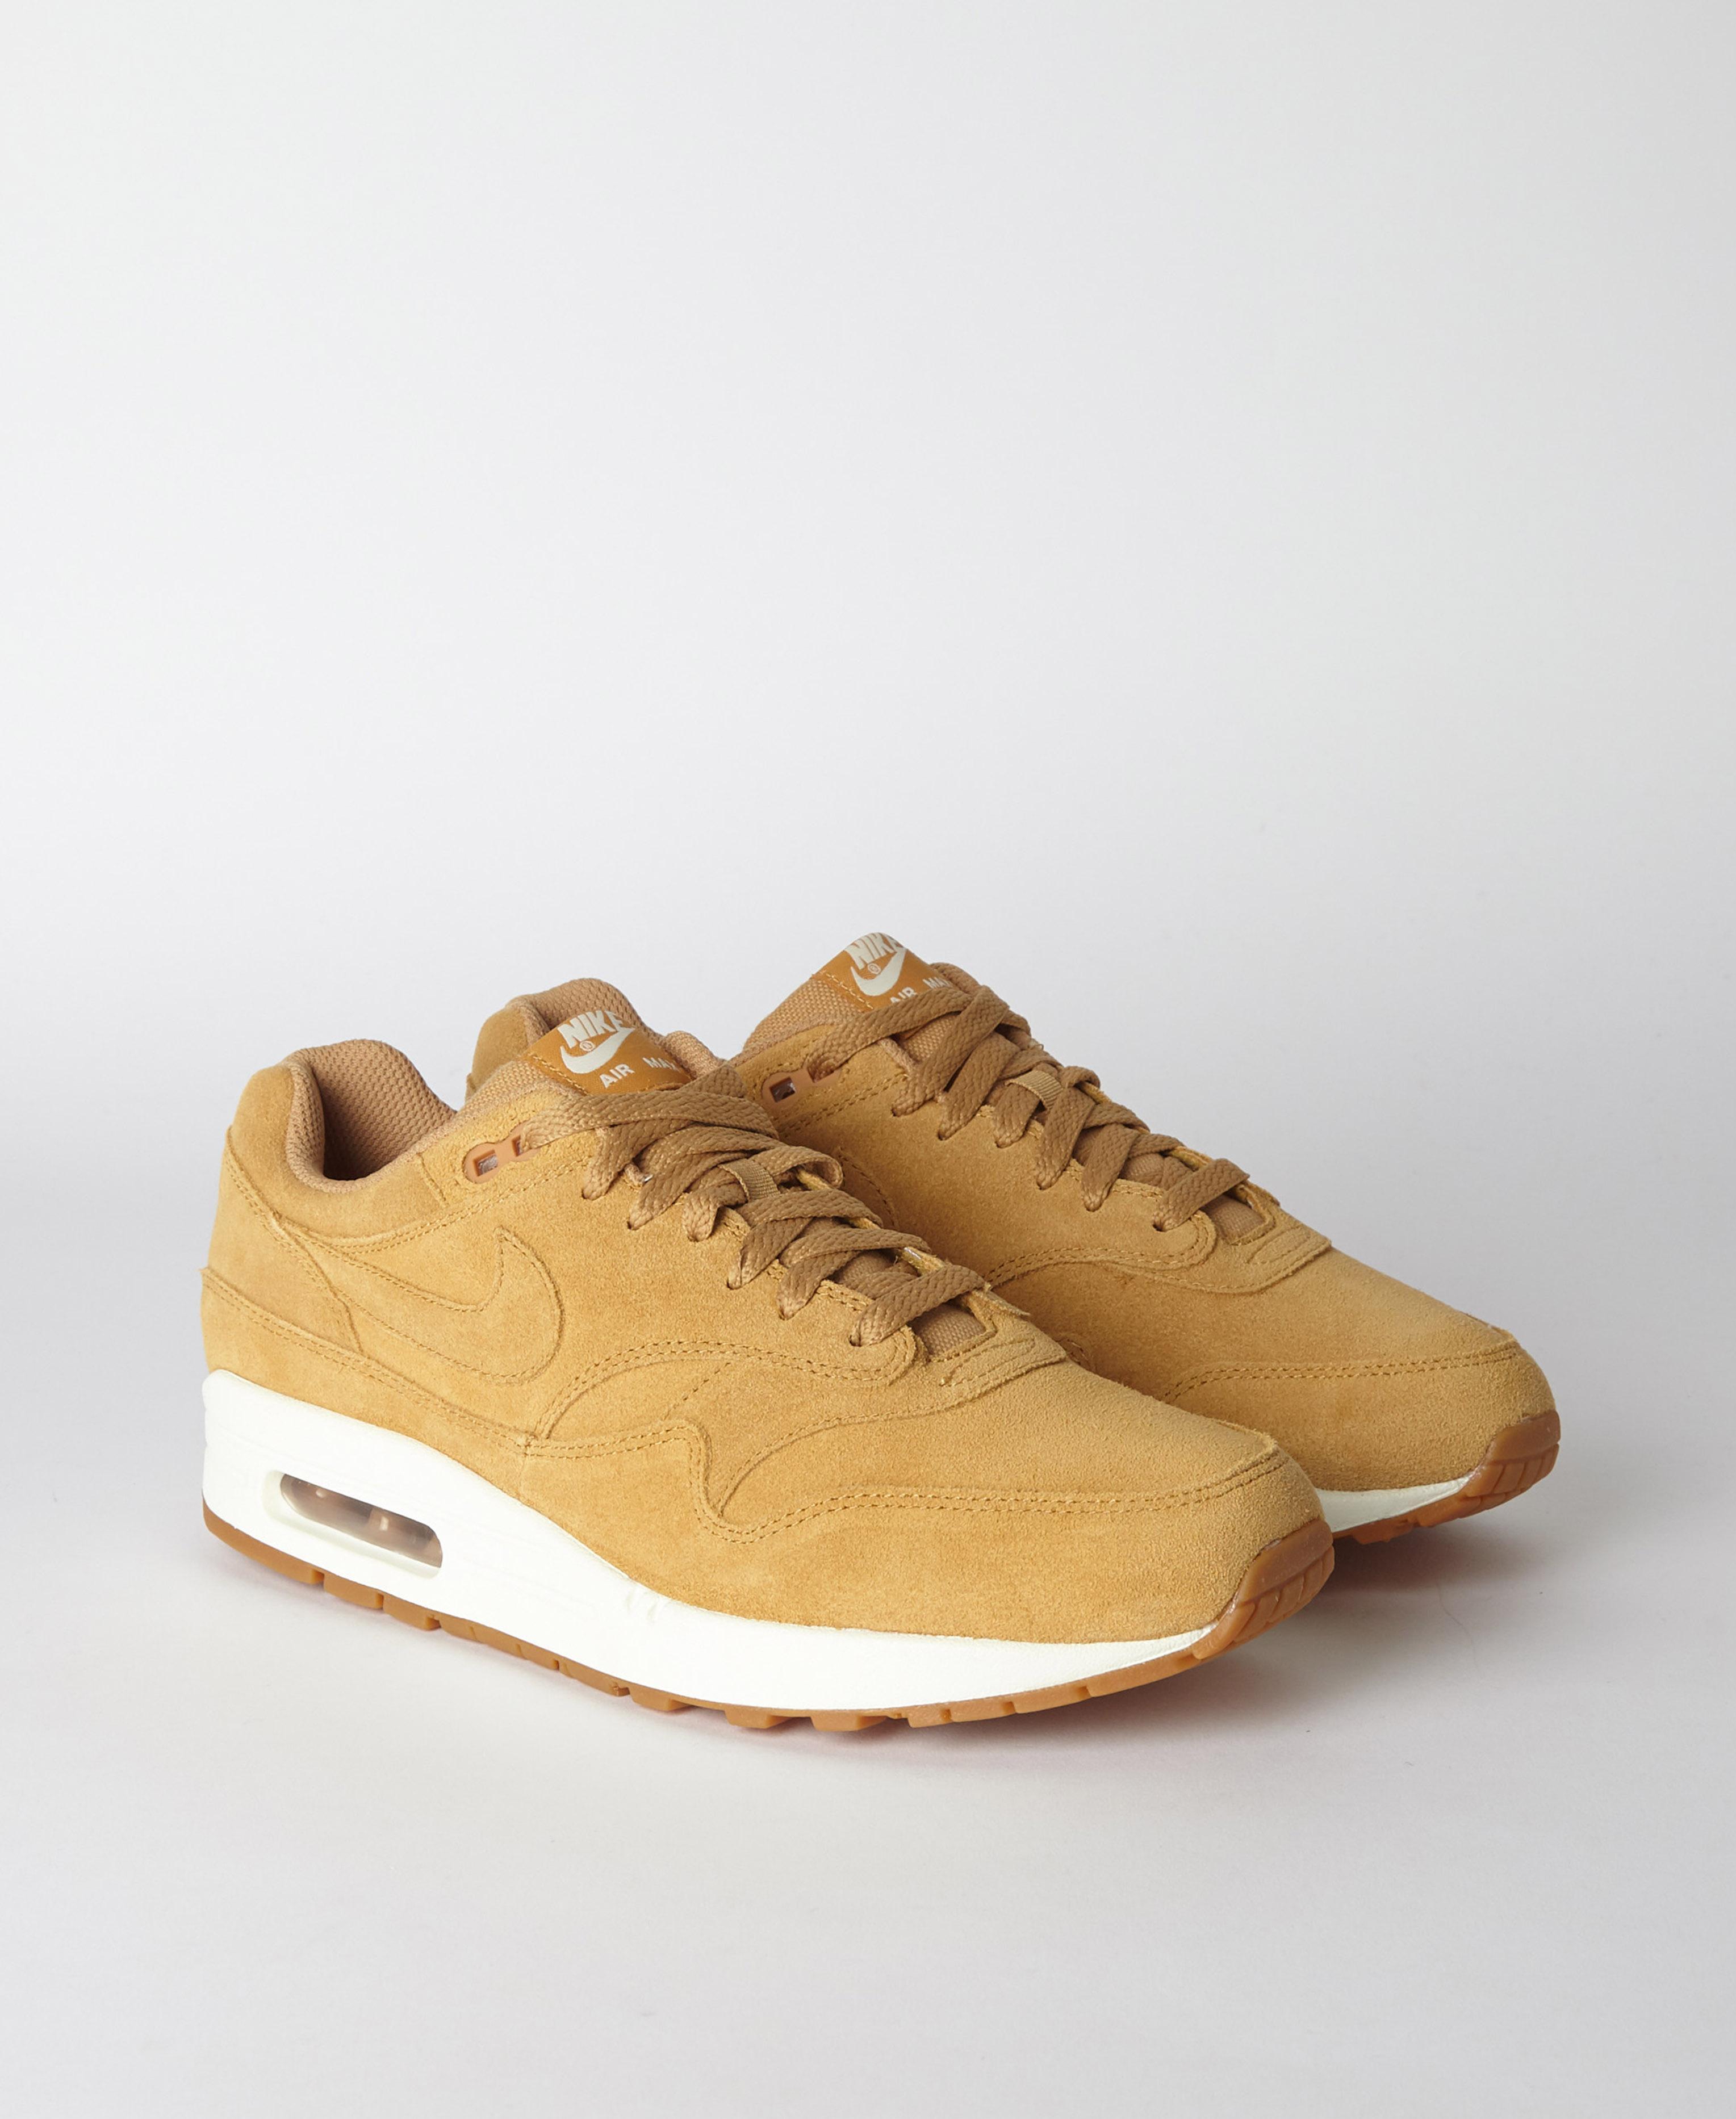 Lyst Nike Air Max 1 Premium 'flax Pack' for Men